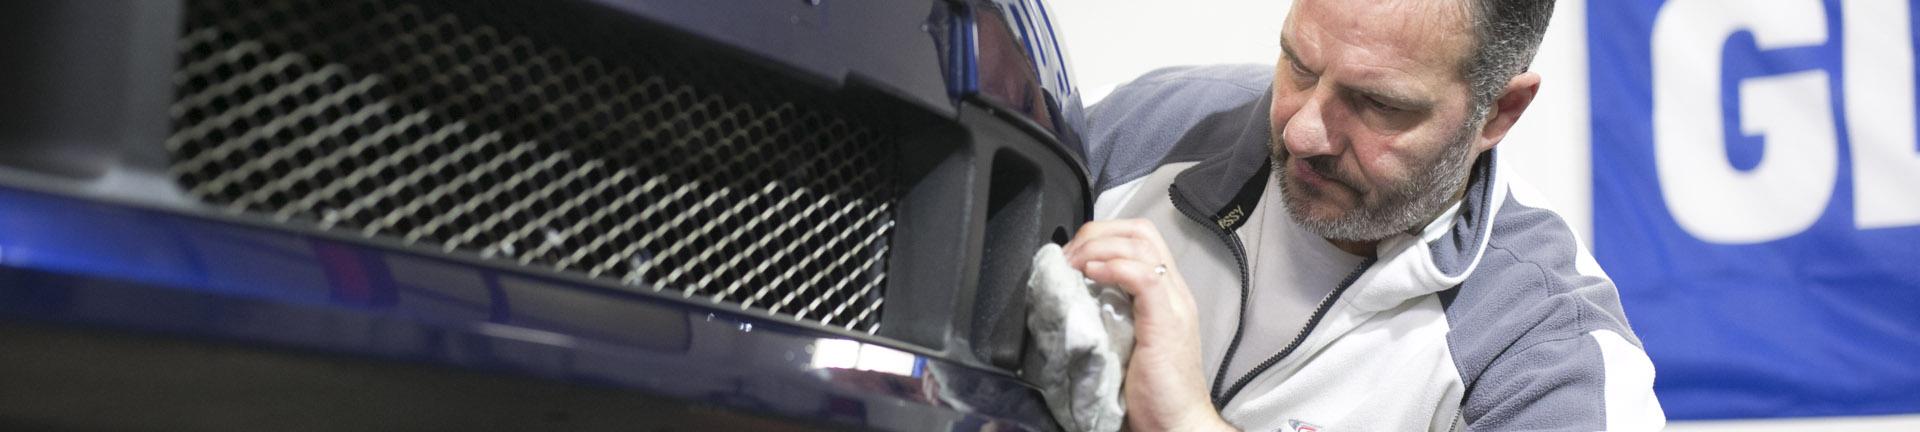 Car detailing - Automorphose charleroi